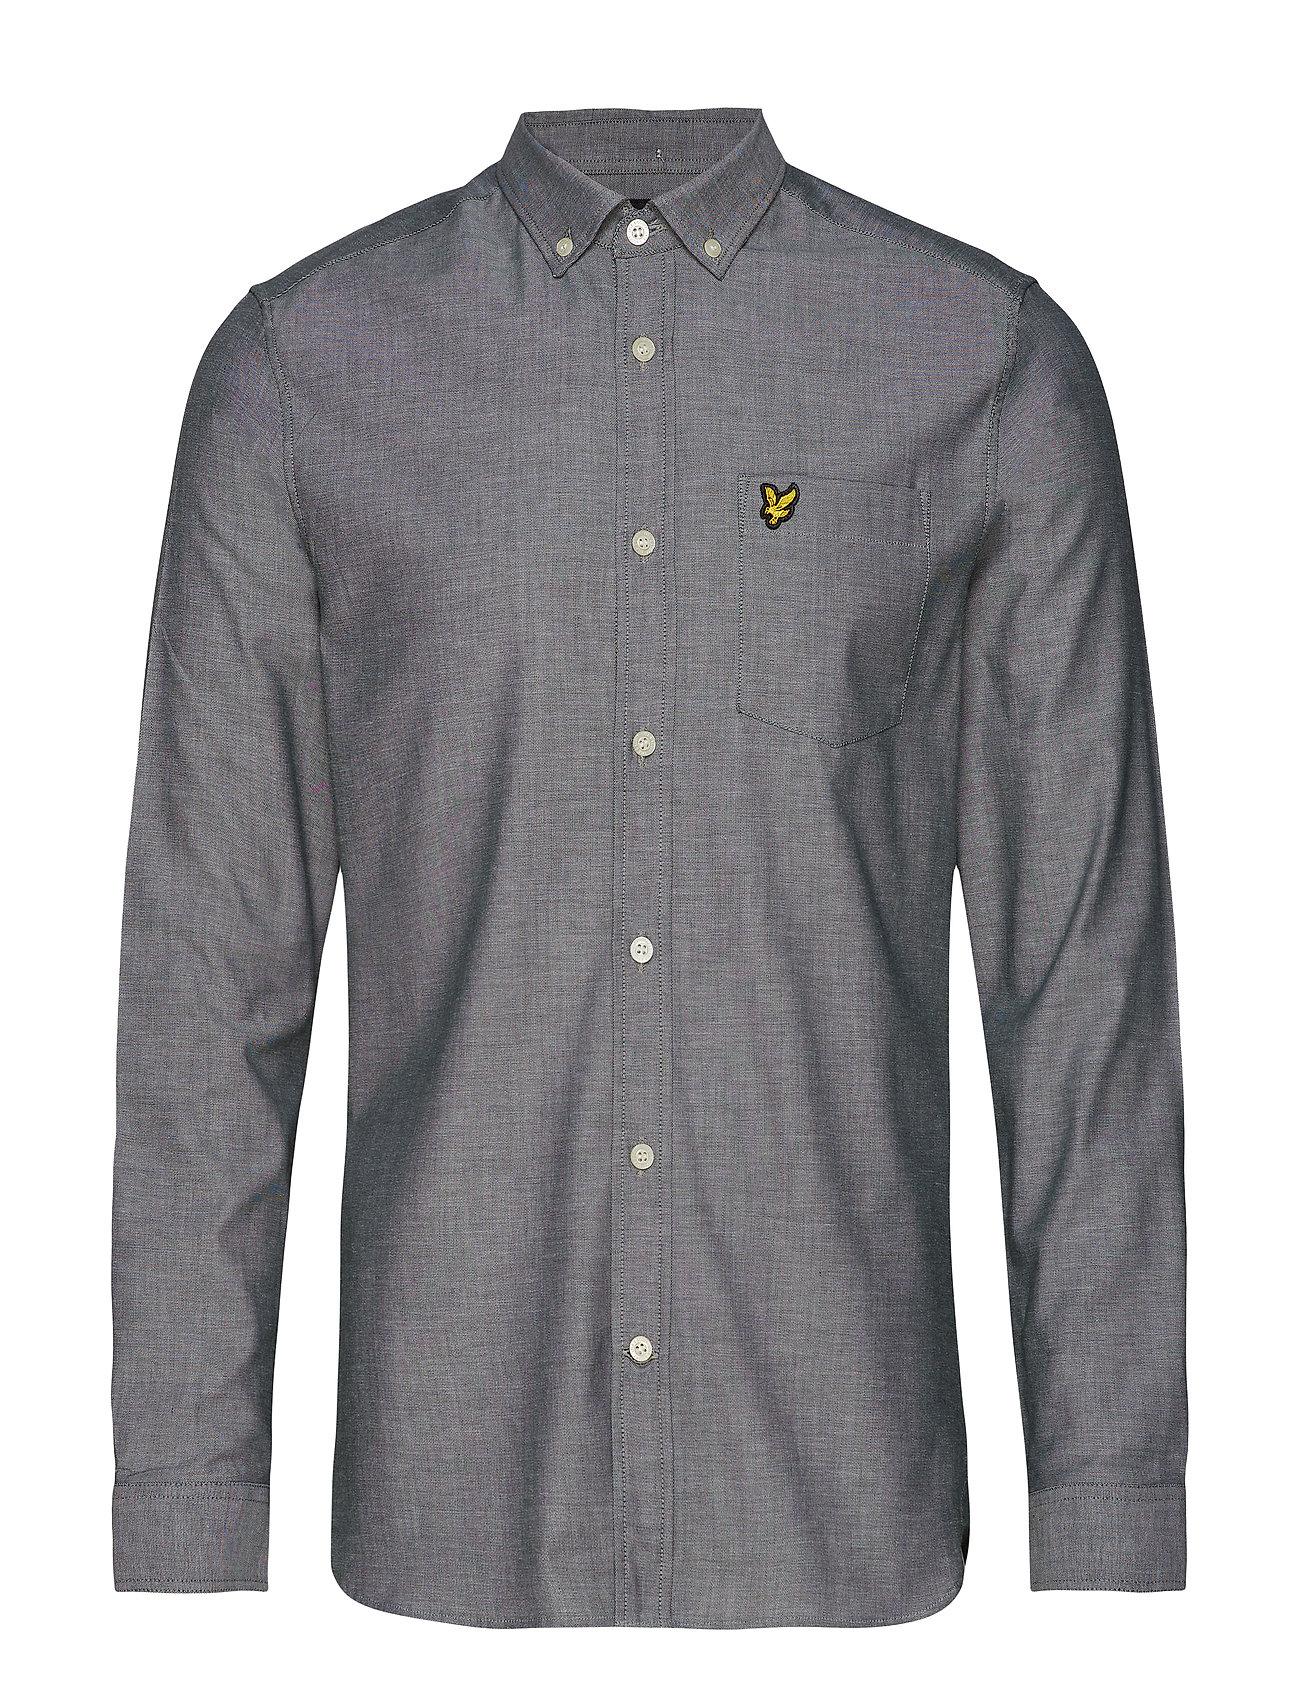 Lyle & Scott Slim Fit Oxford Shirt - JADE GREEN